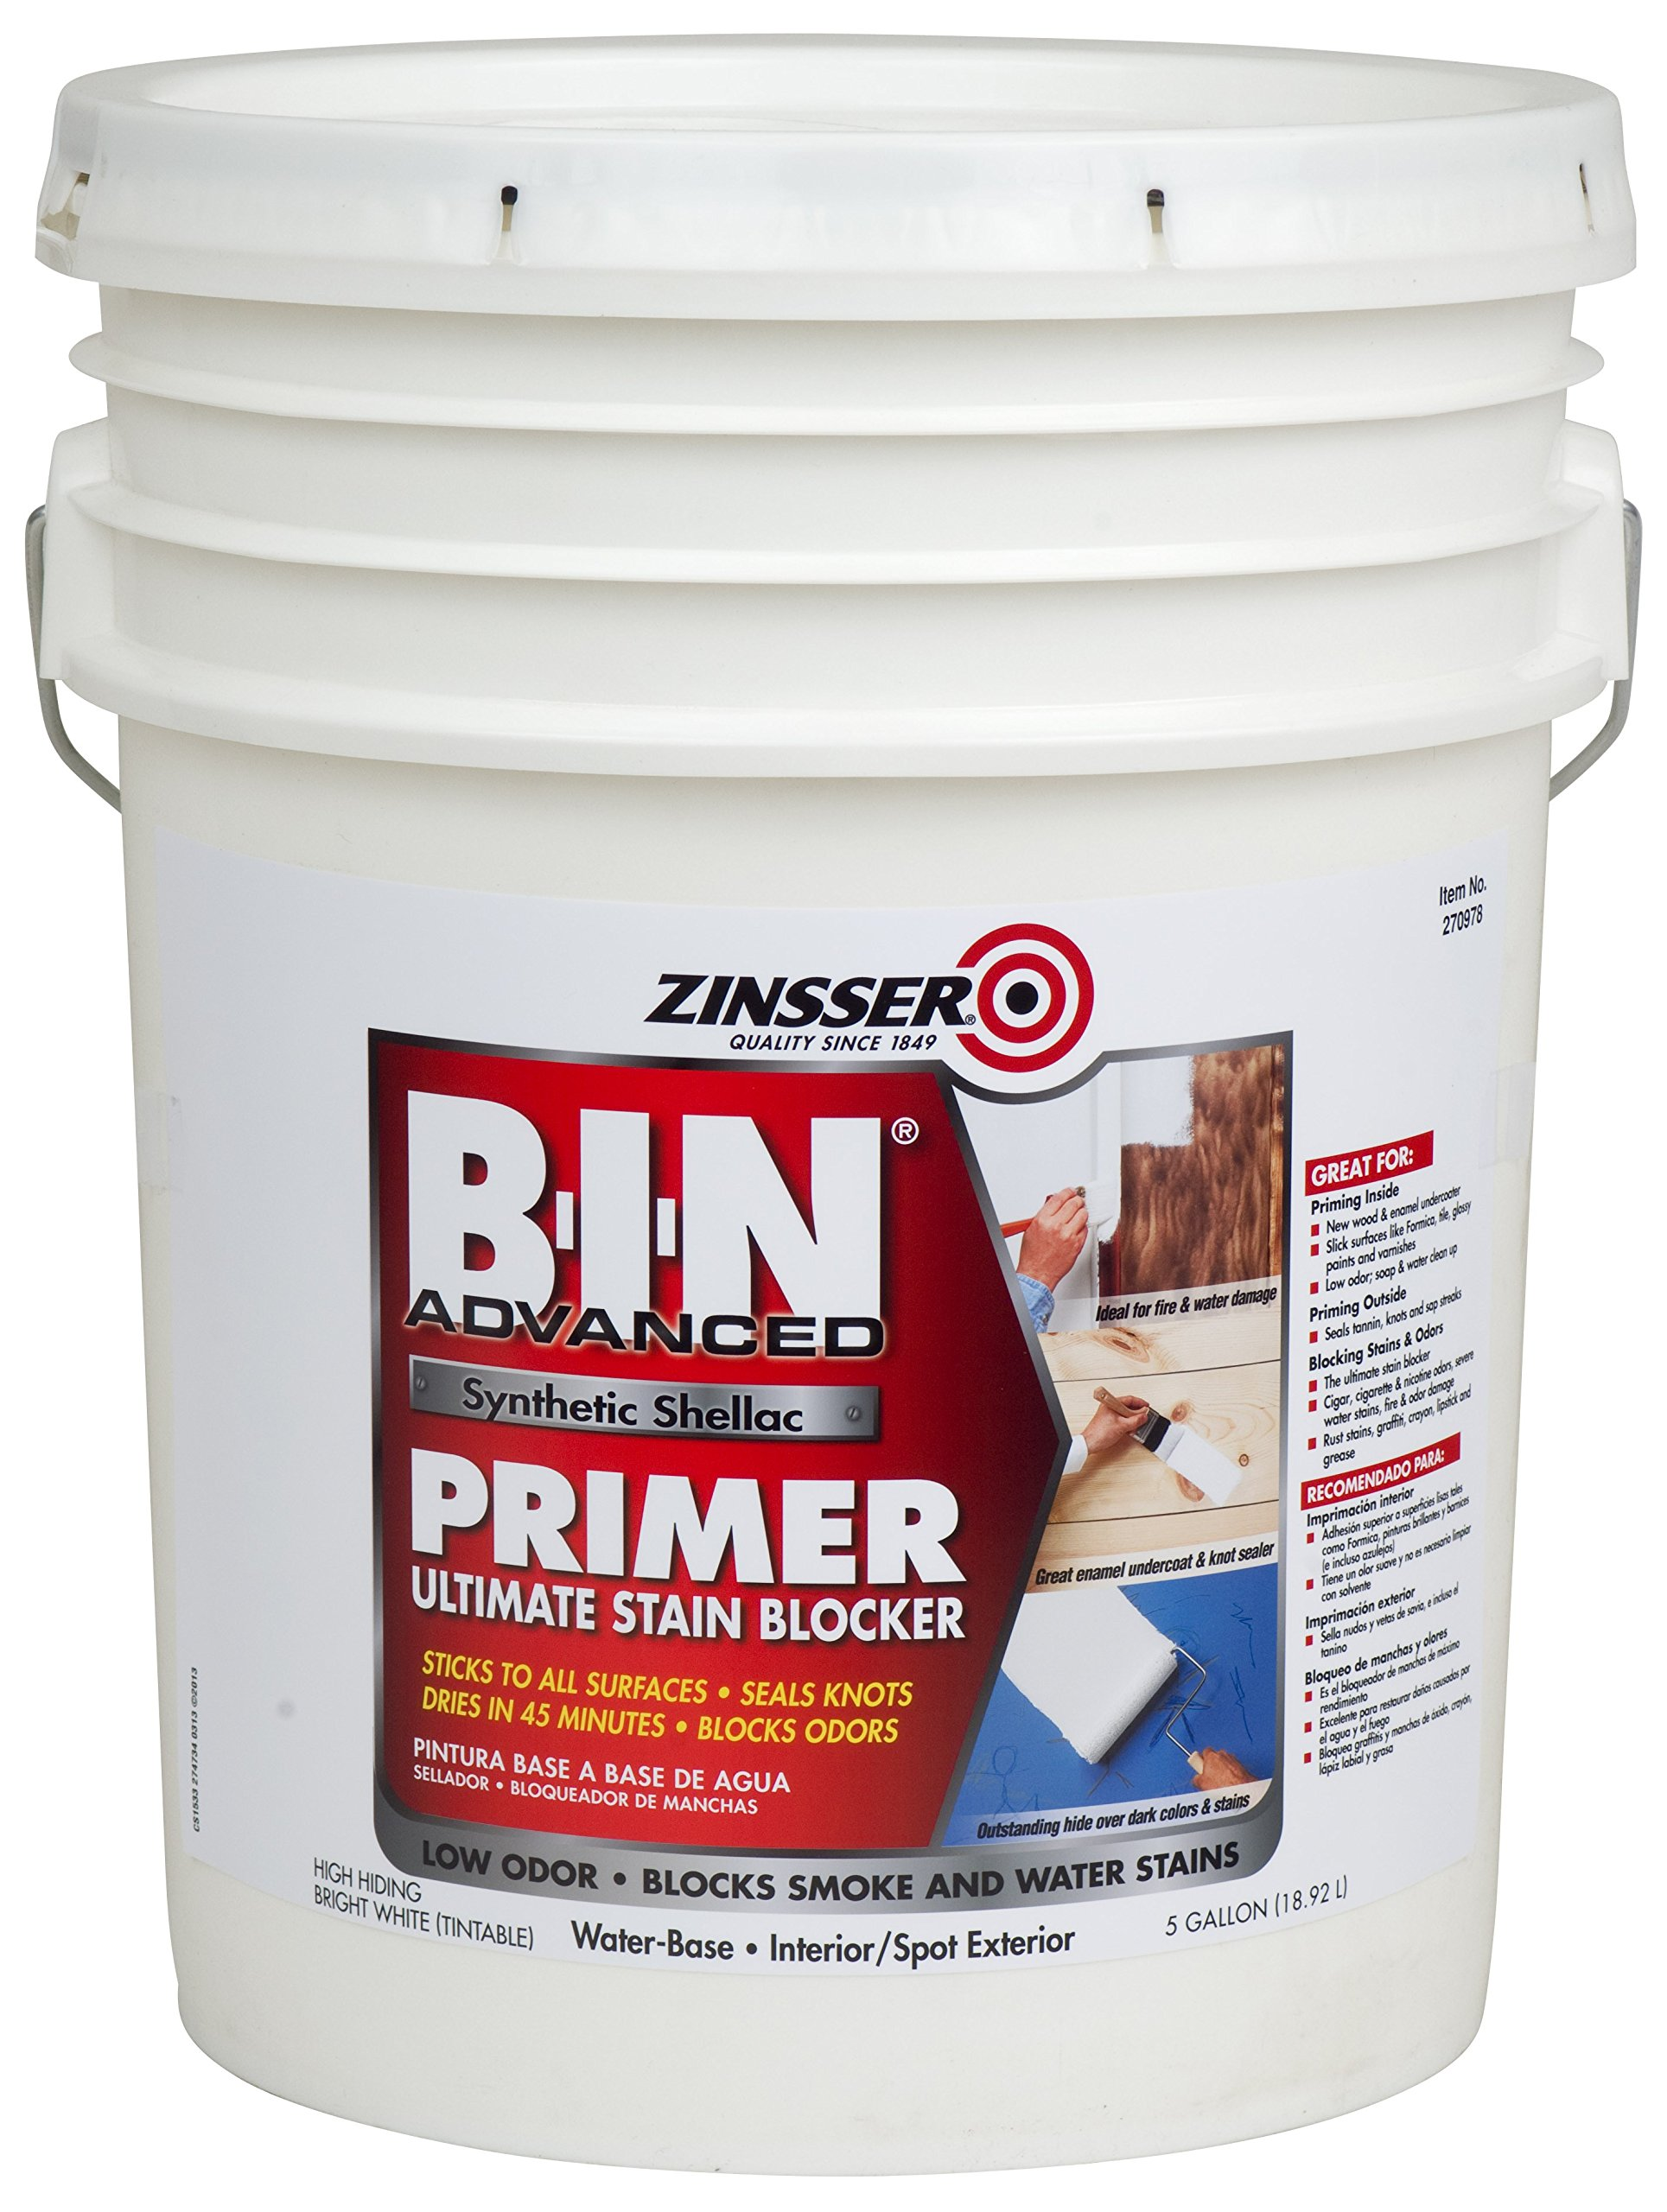 Rust-Oleum 270978 White Zinsser B-I-N Advanced Synthetic Shellac Primer, 5 gal Pail